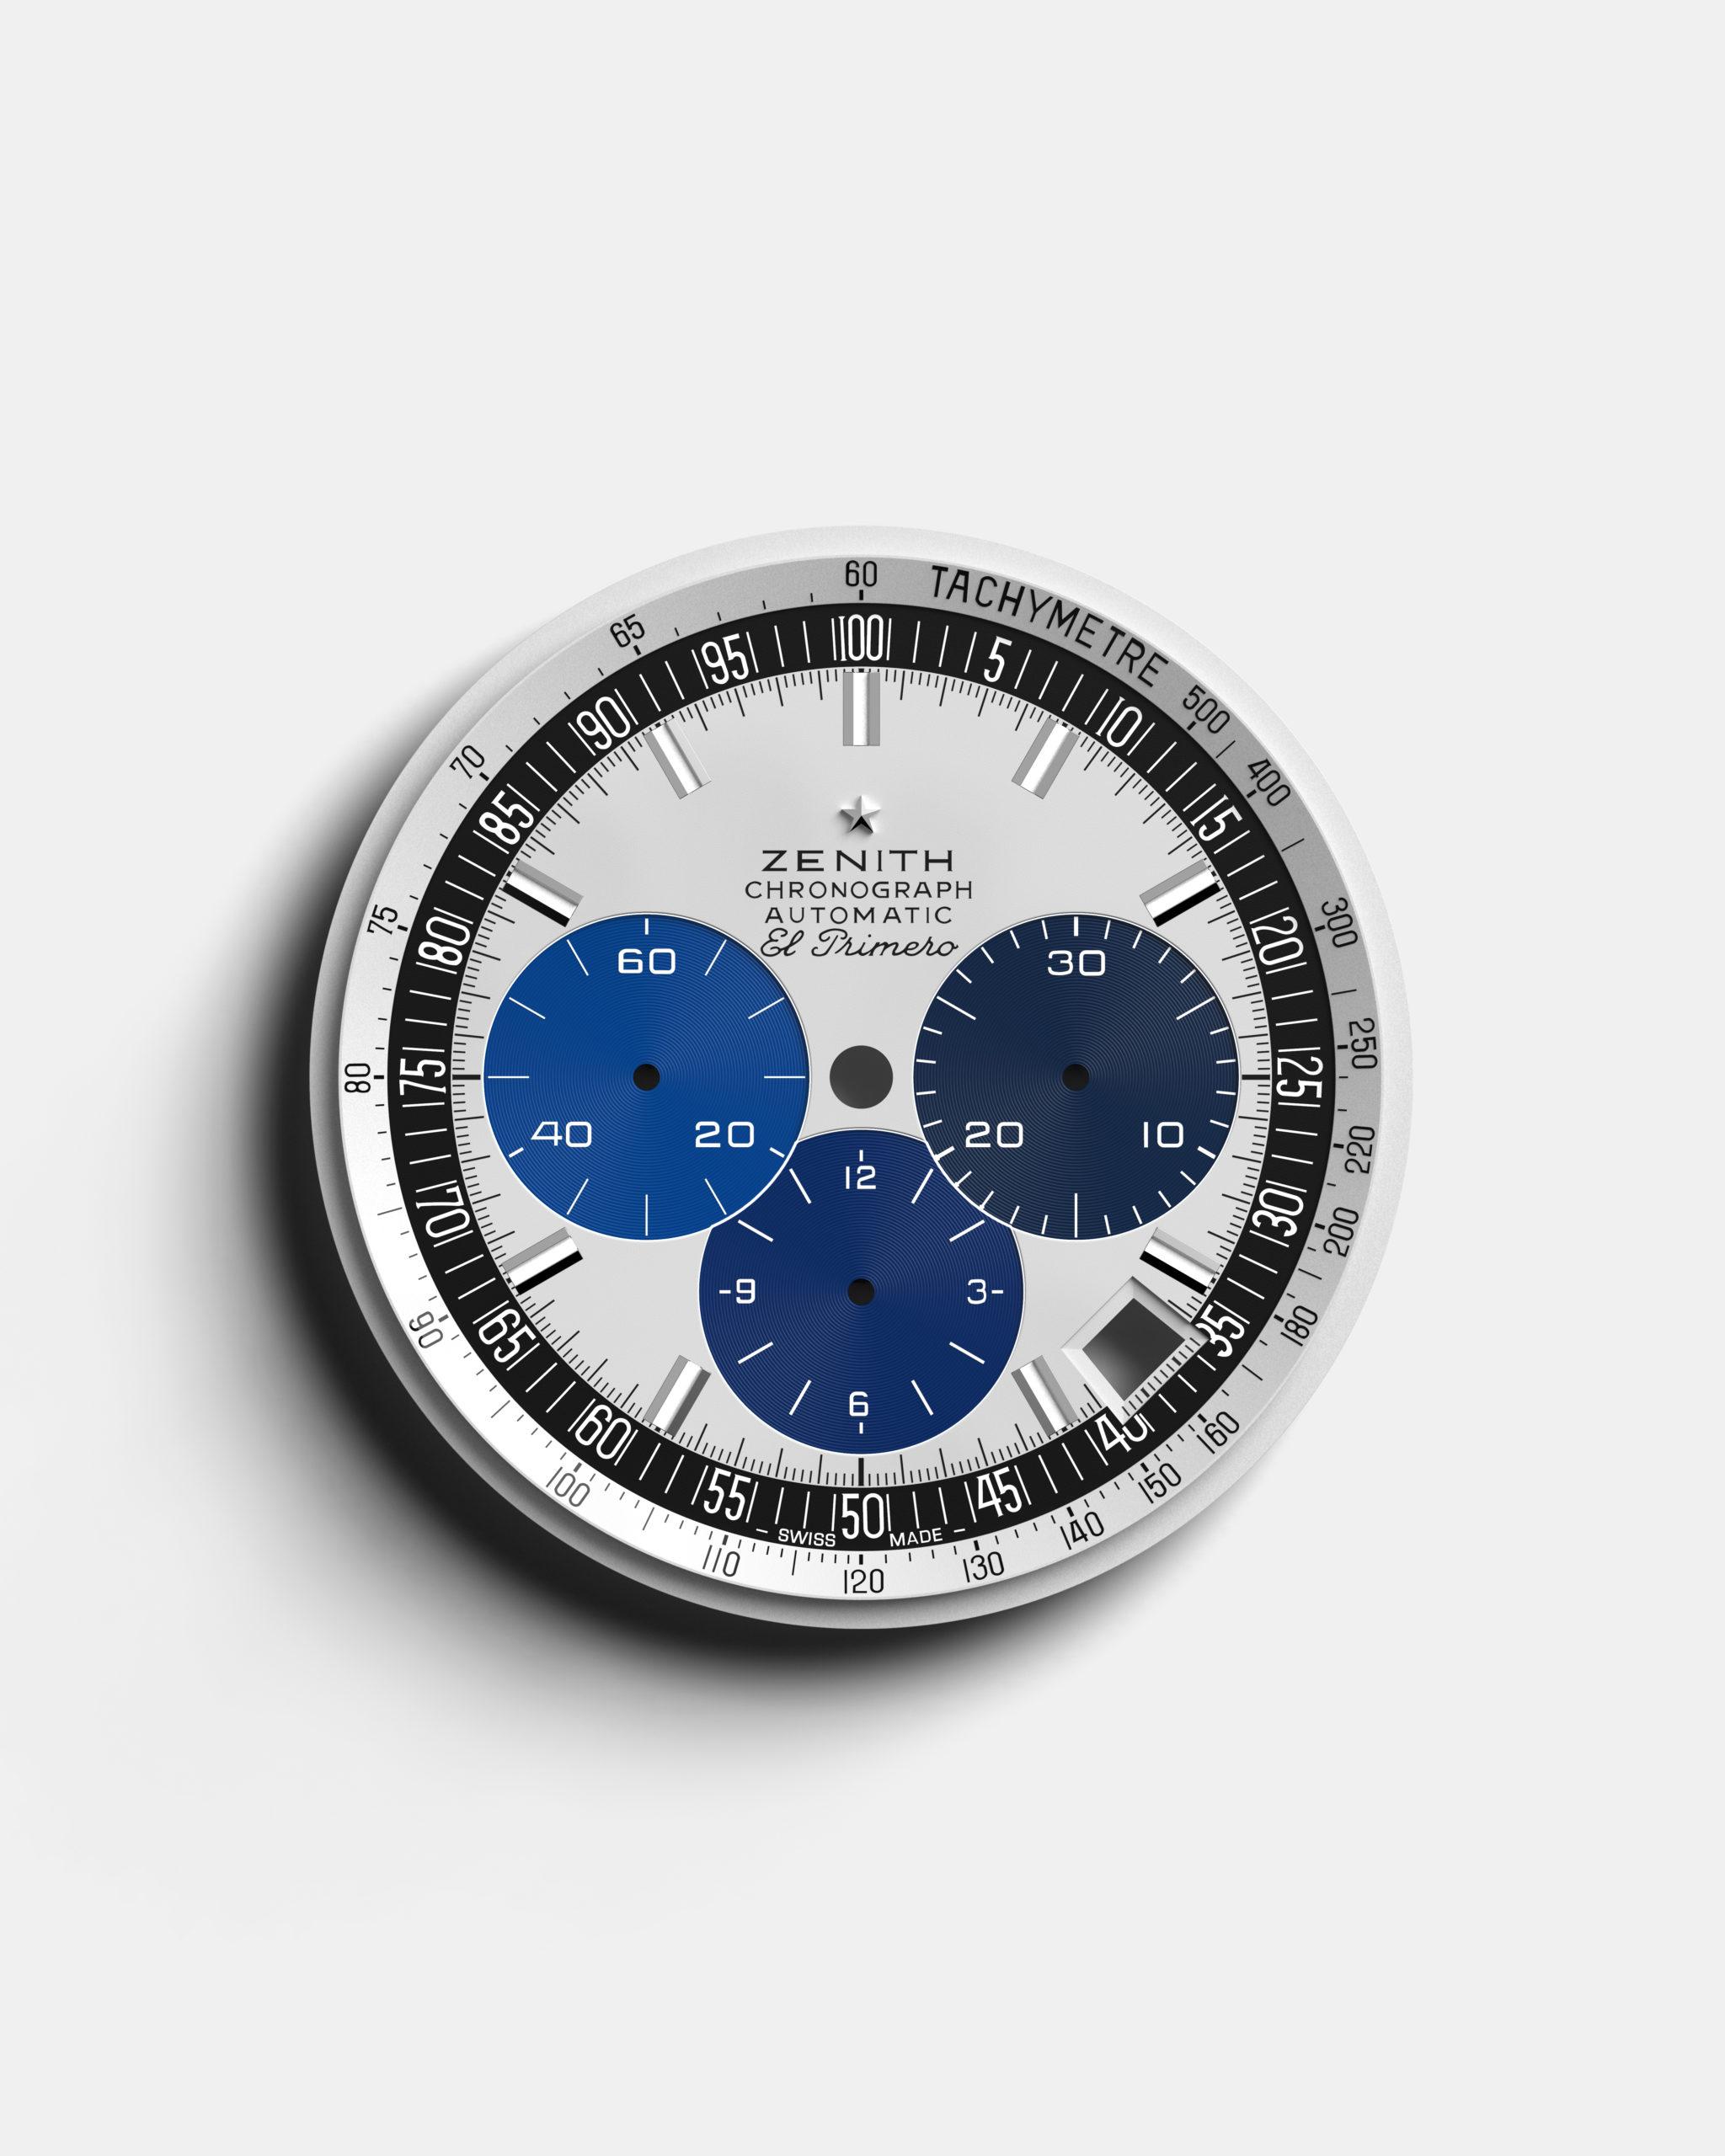 Uhrenmanufaktur Zenith